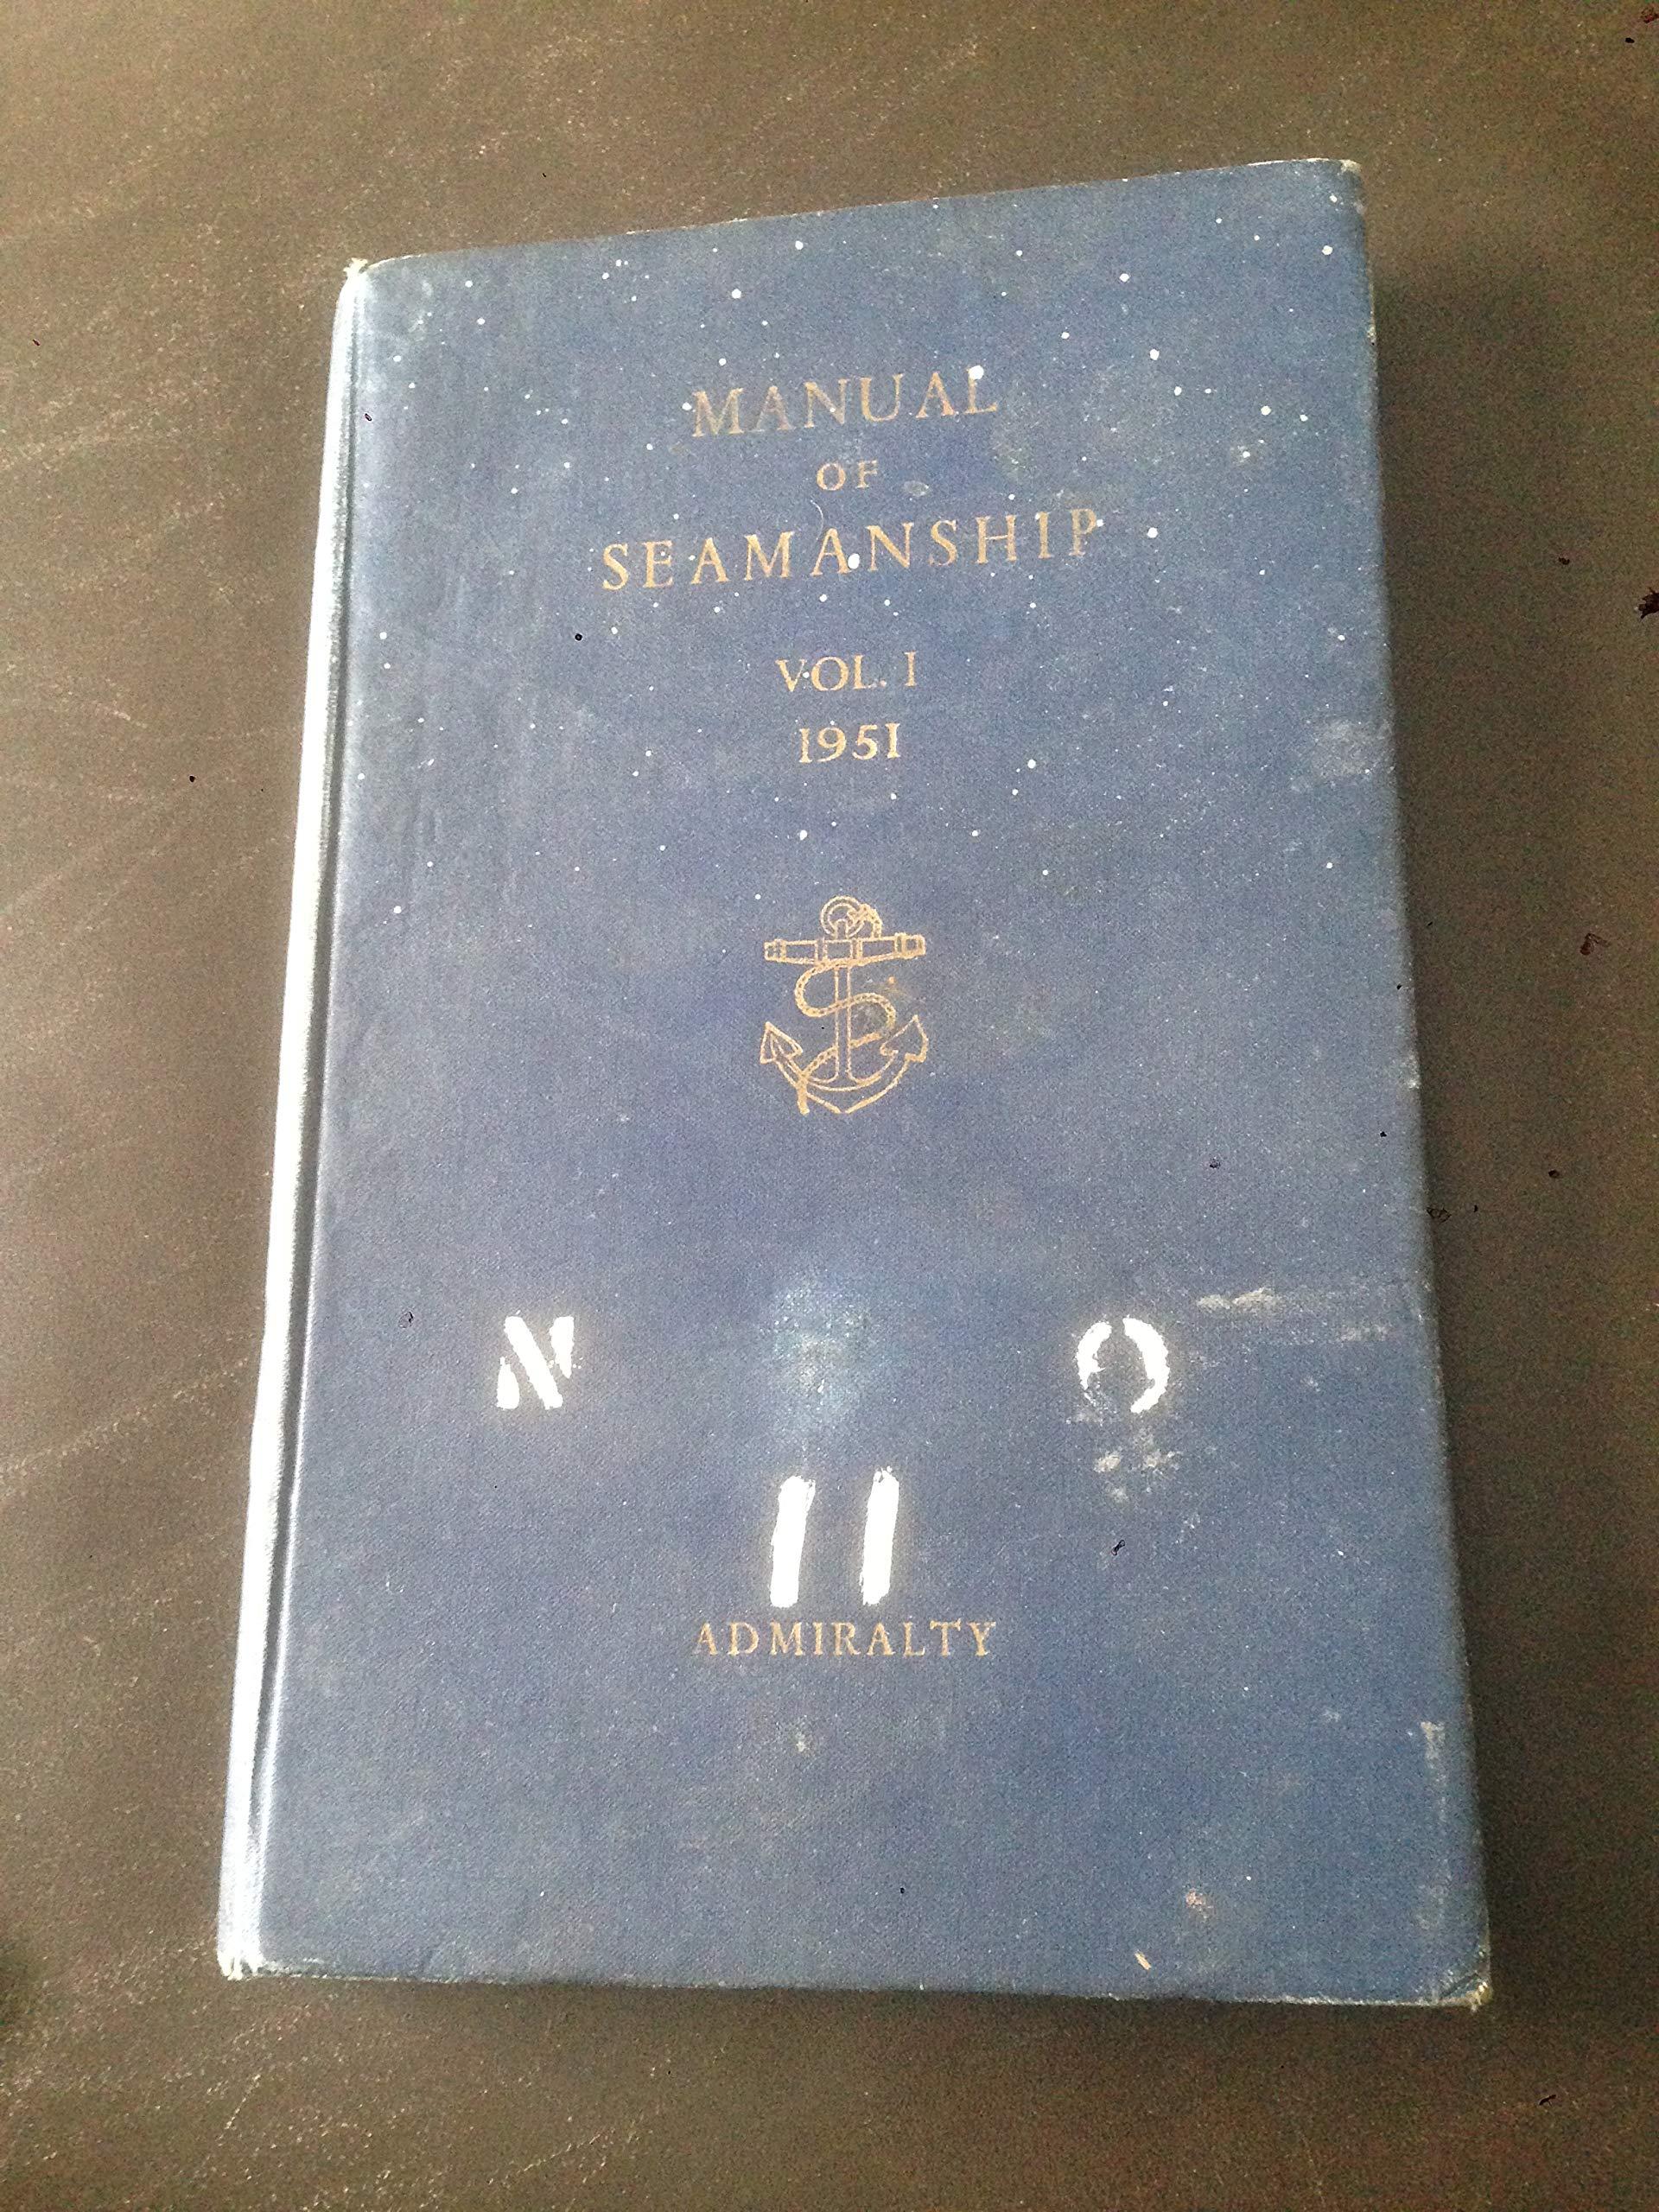 Admiralty Manual of Seamanship 1951 Volume I: Amazon.co.uk: Admiralty: Books